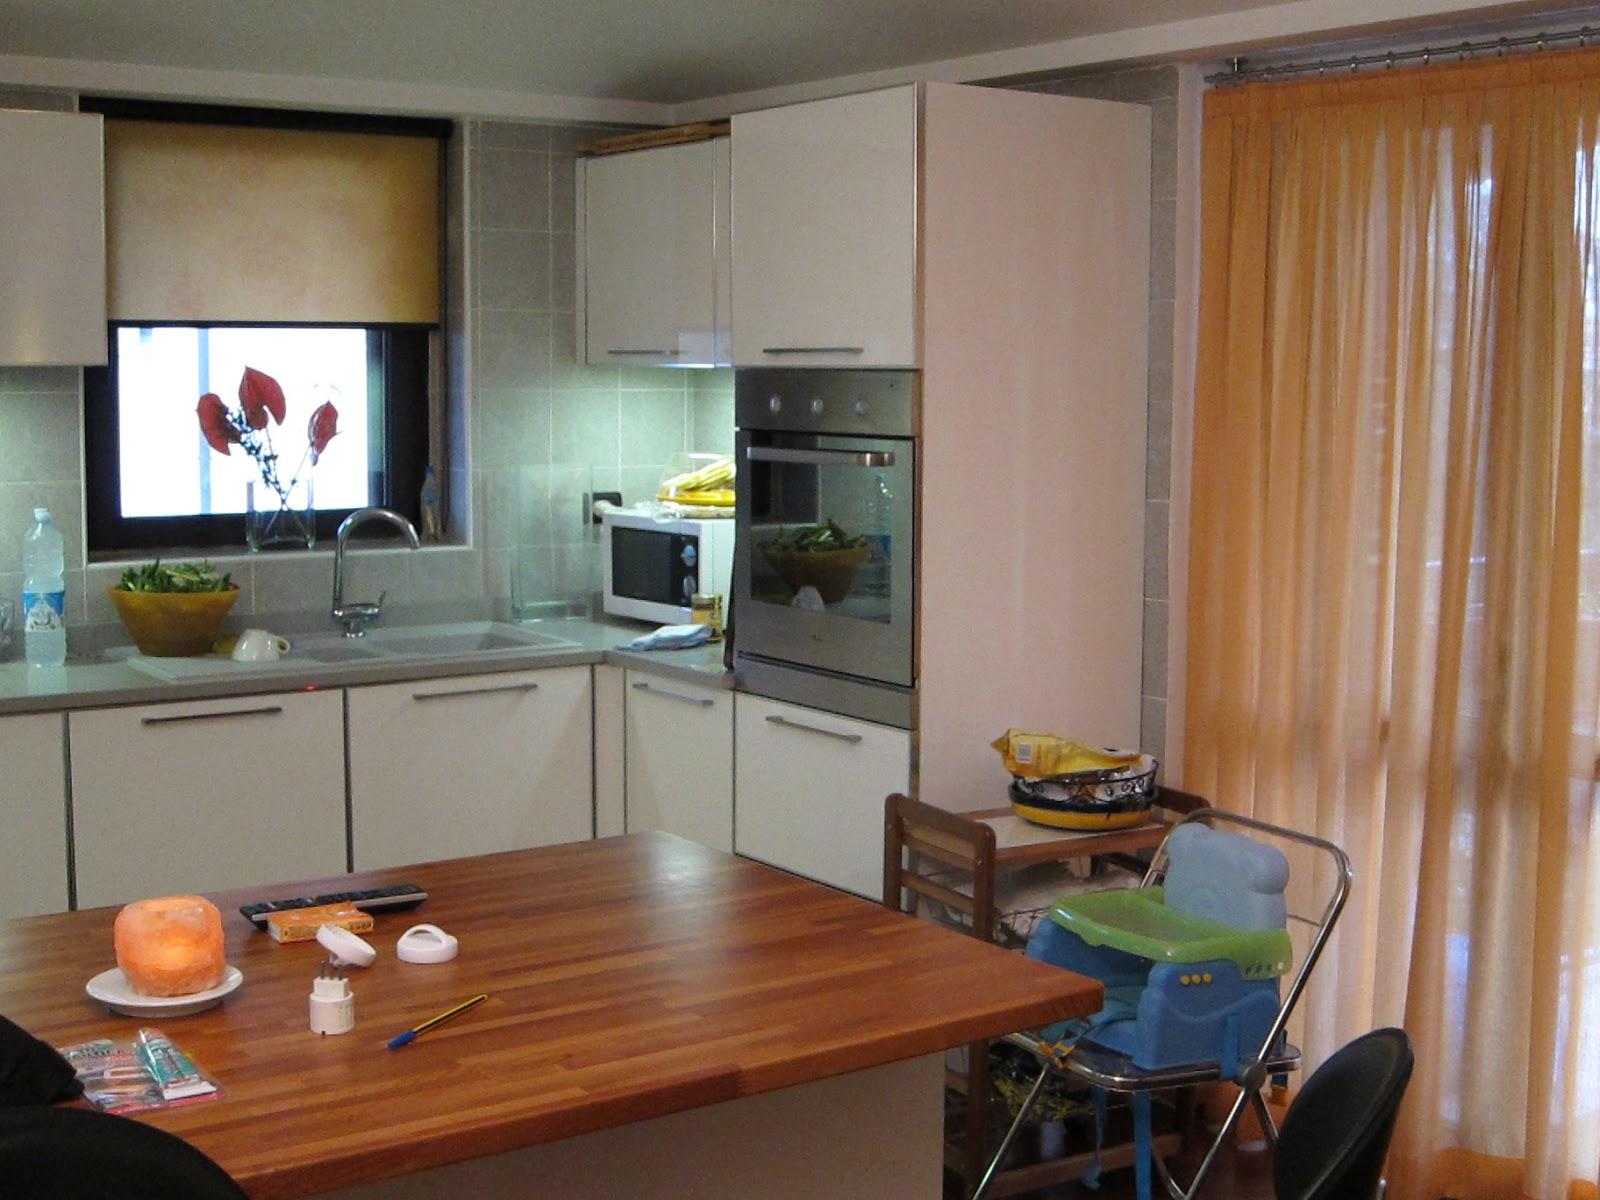 Elleemmetende lmtende tende da interni per migliorare l for Tende casa classica